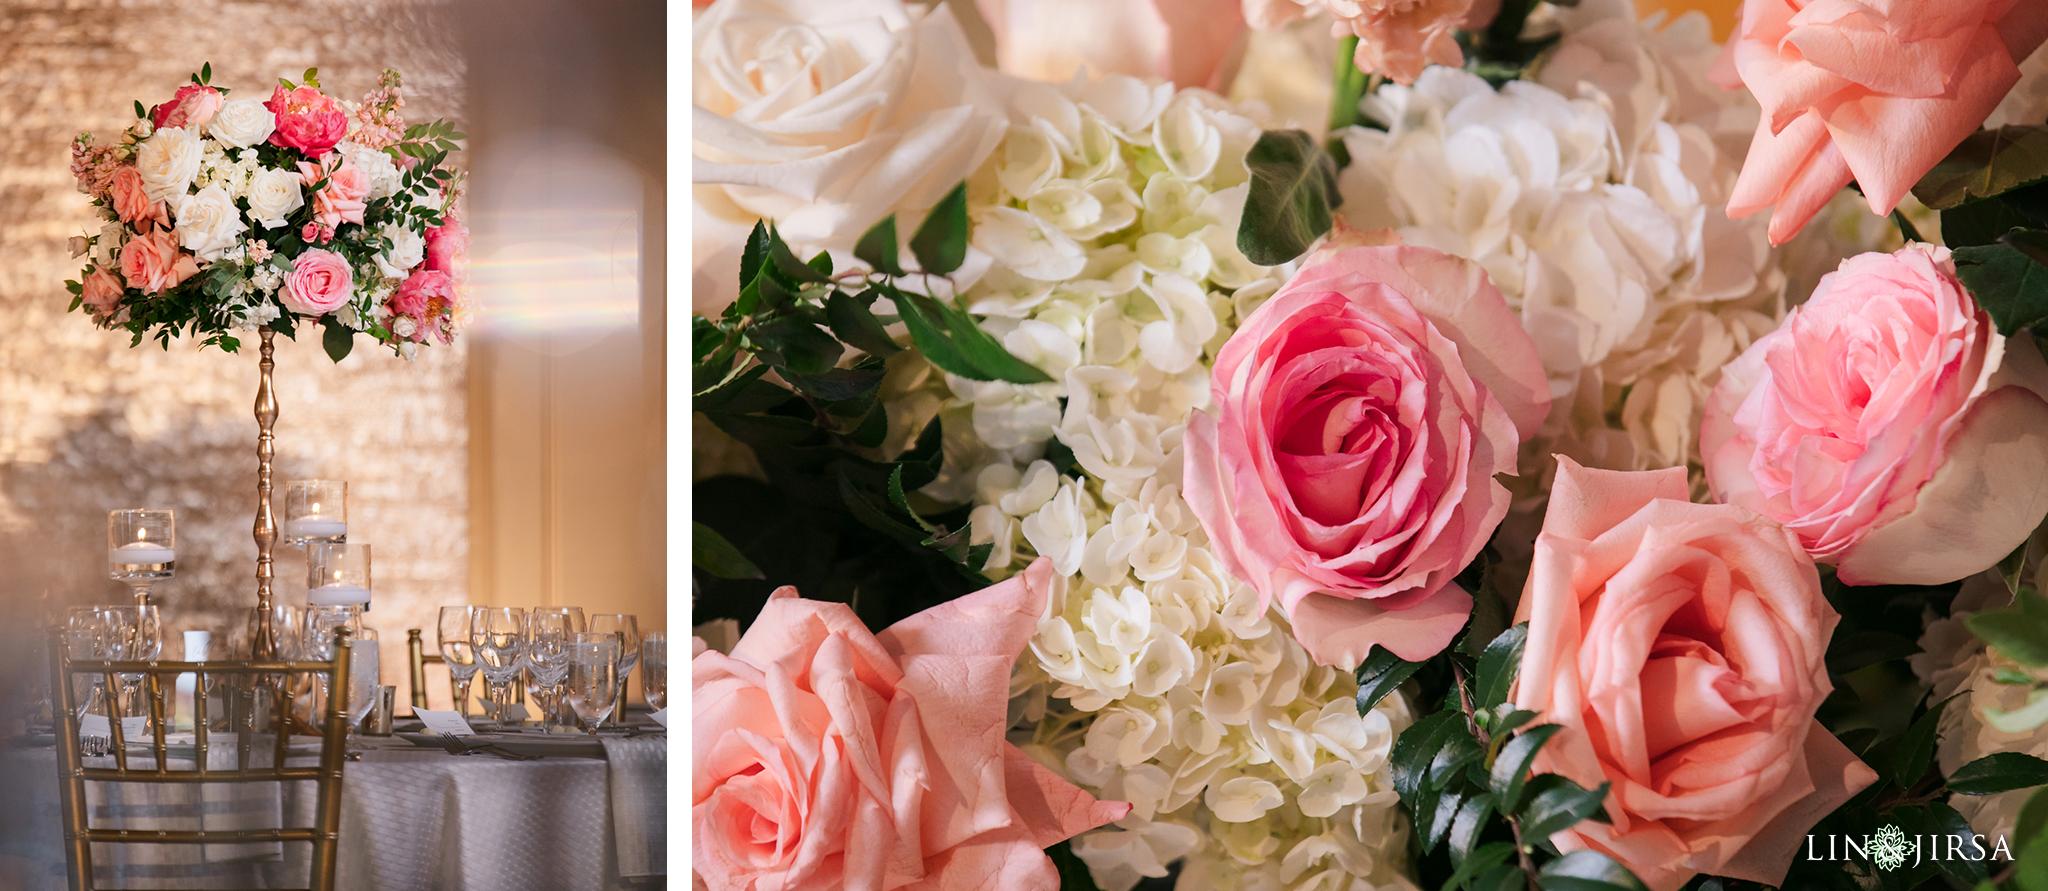 33 Ritz Carlton Laguna Niguel Wedding Photography